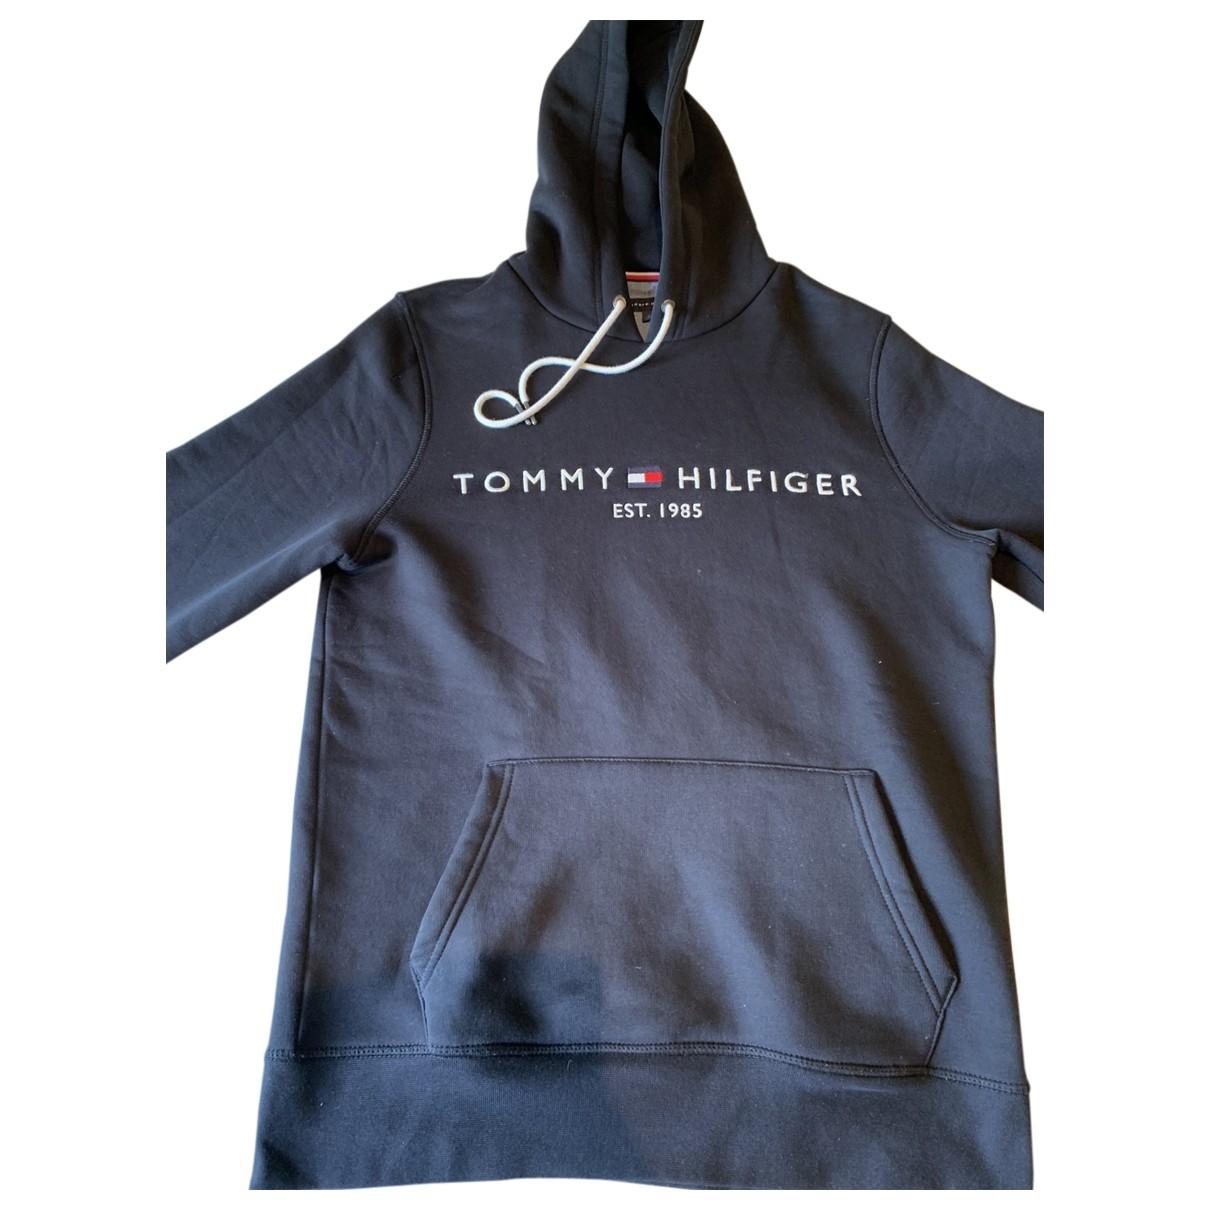 Tommy Hilfiger \N Black Cotton Knitwear & Sweatshirts for Men S International